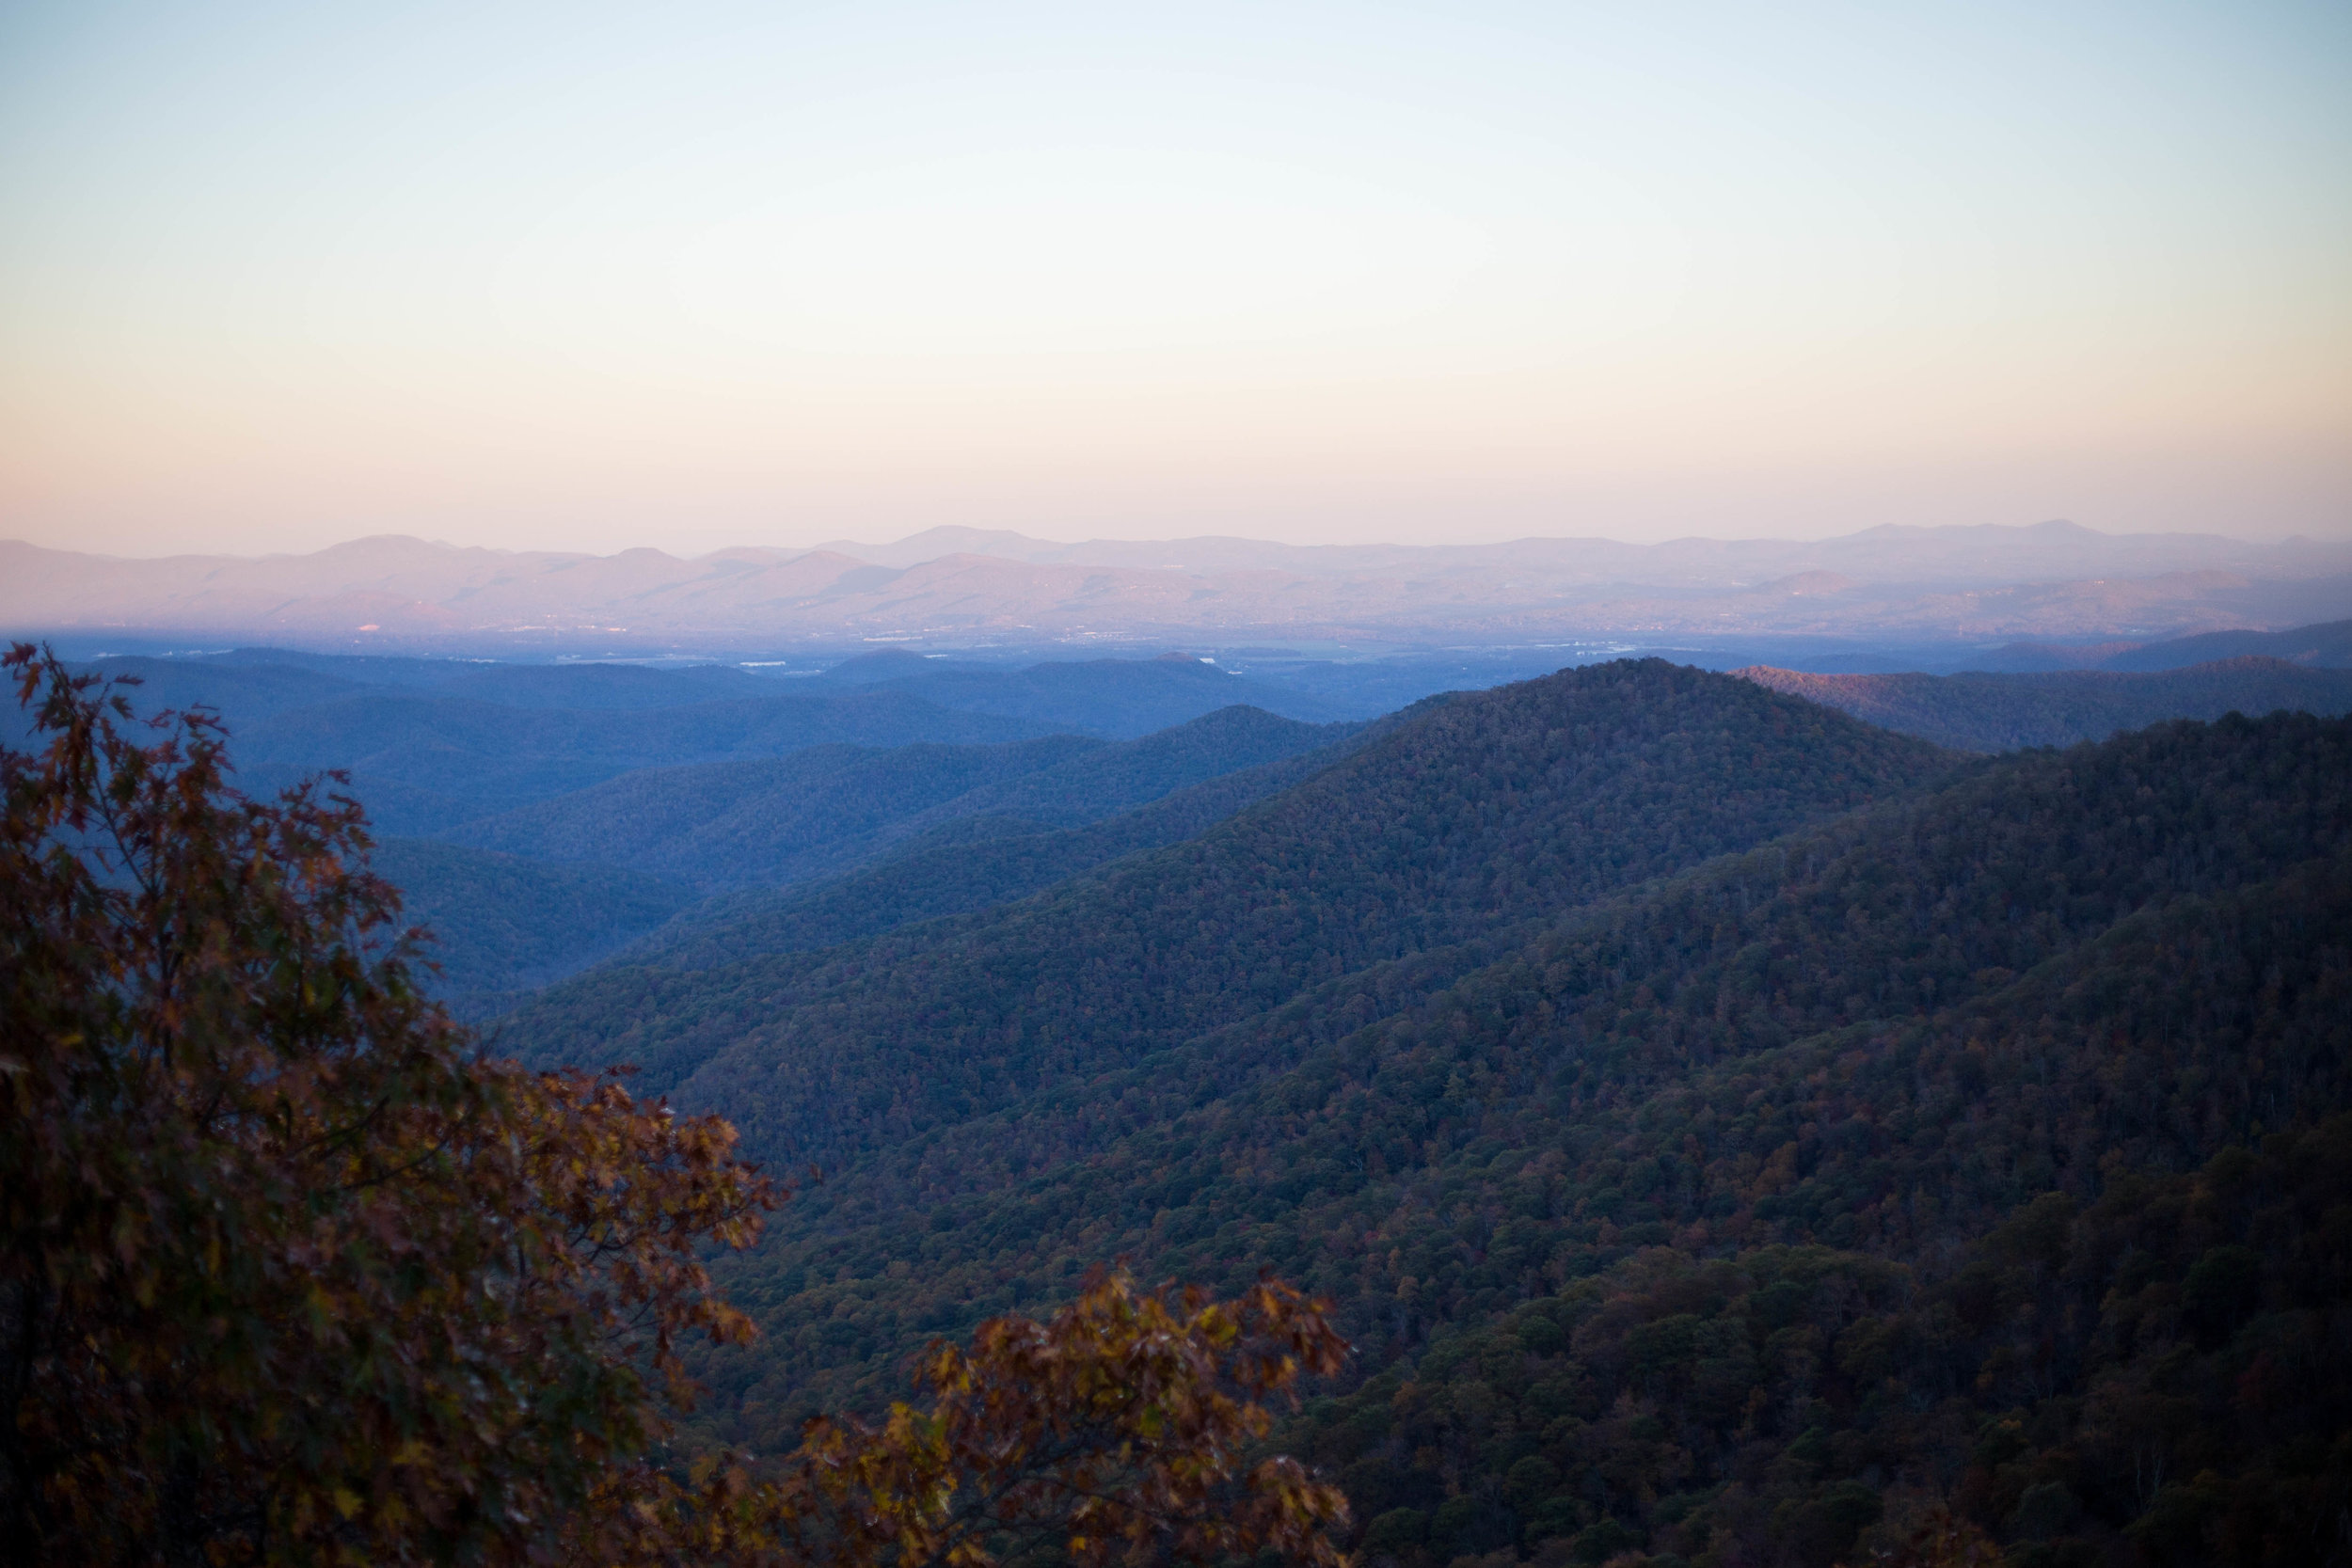 Blue Ridge Mountains of N.C. - @evergreenerafilms